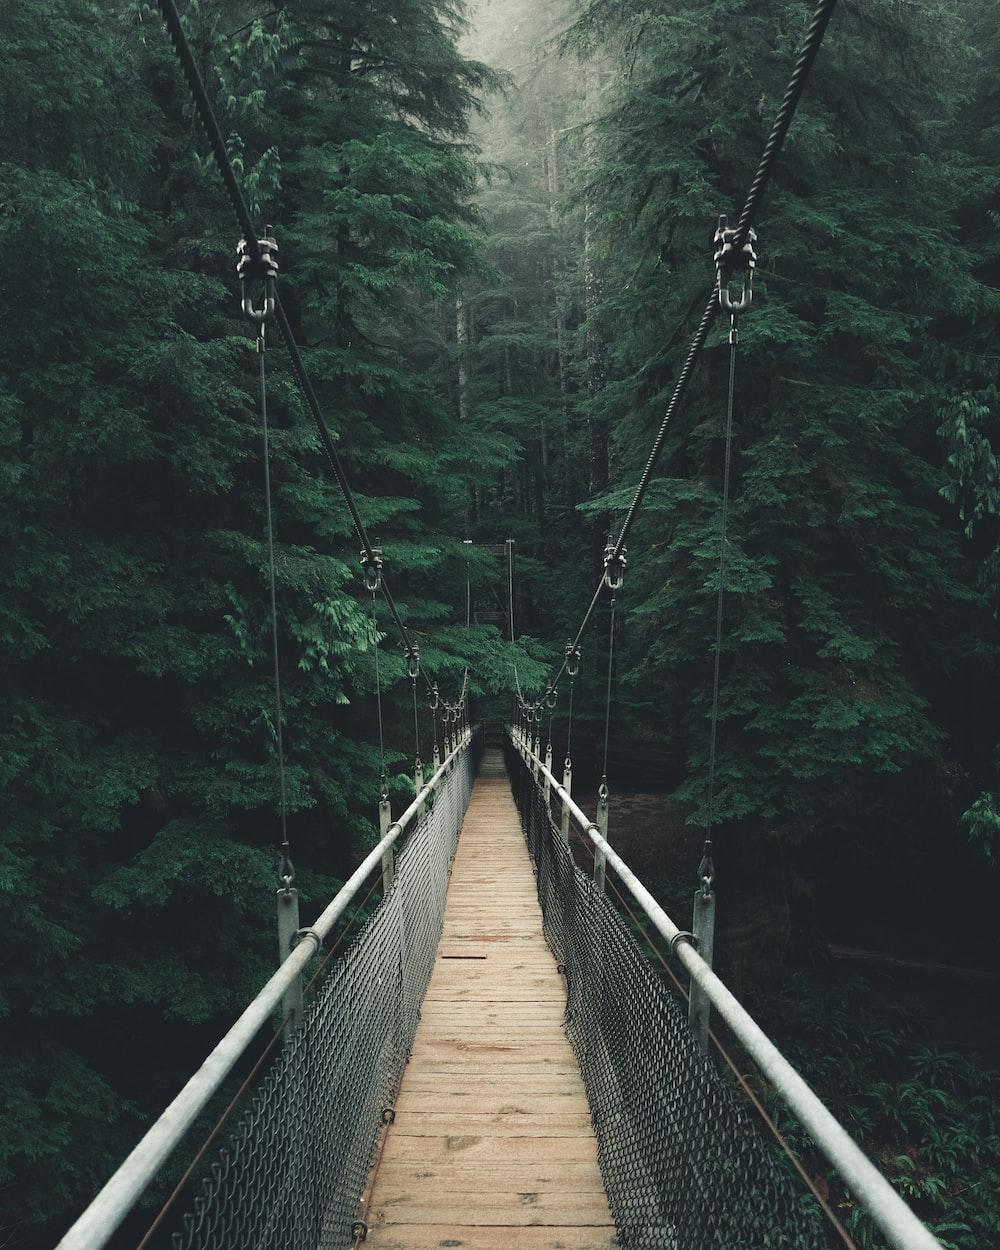 single perspective photography of bridge in between trees